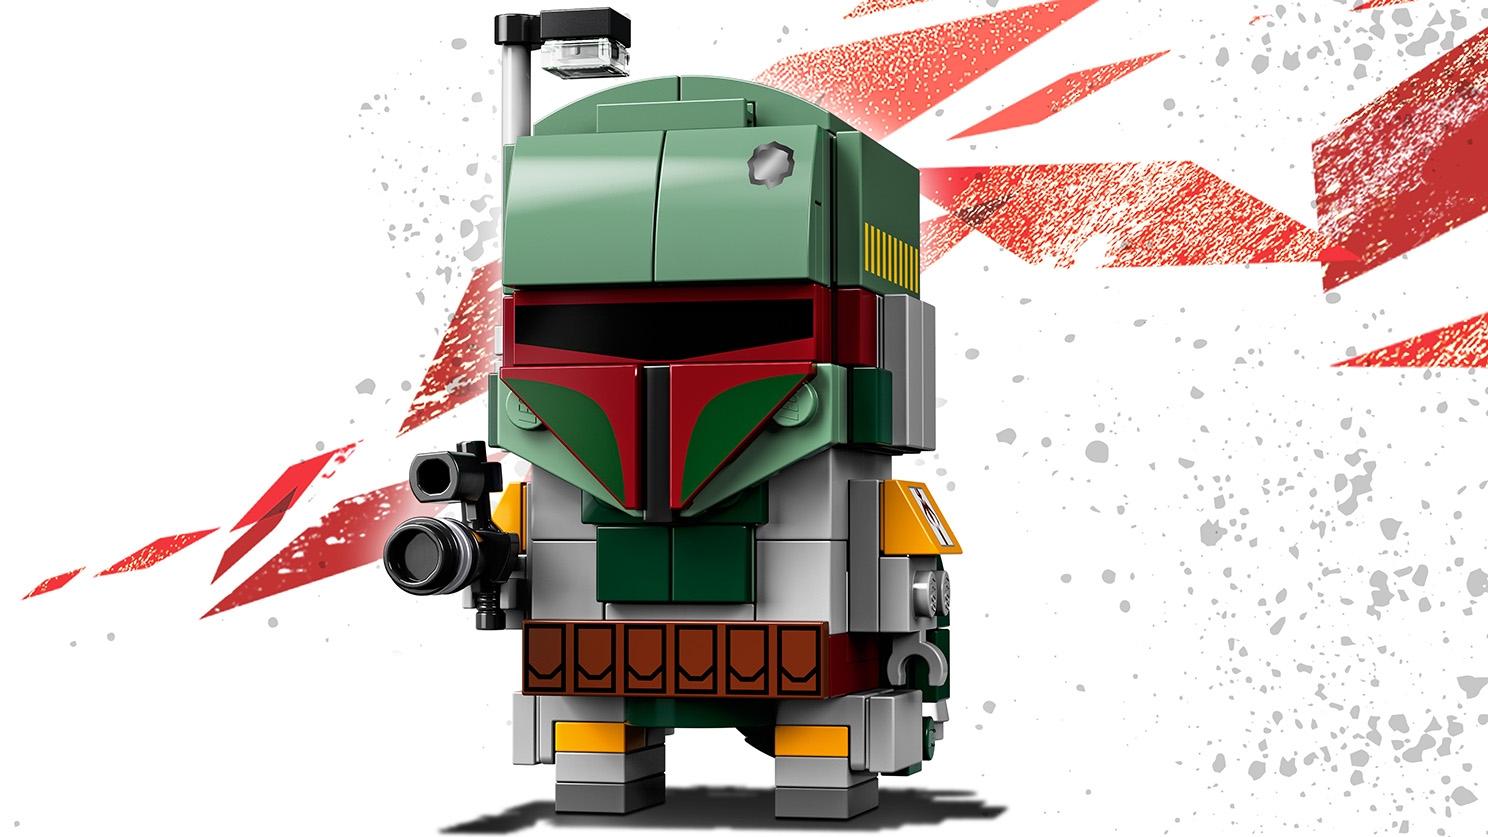 LEGO Brickheadz - 41629 Boba Fett - Build a LEGO Brickheadz version of the bounty hunter Boba Fett from the movie Star Wars: Episode V The Empire Strikes Back and display on a baseplate.